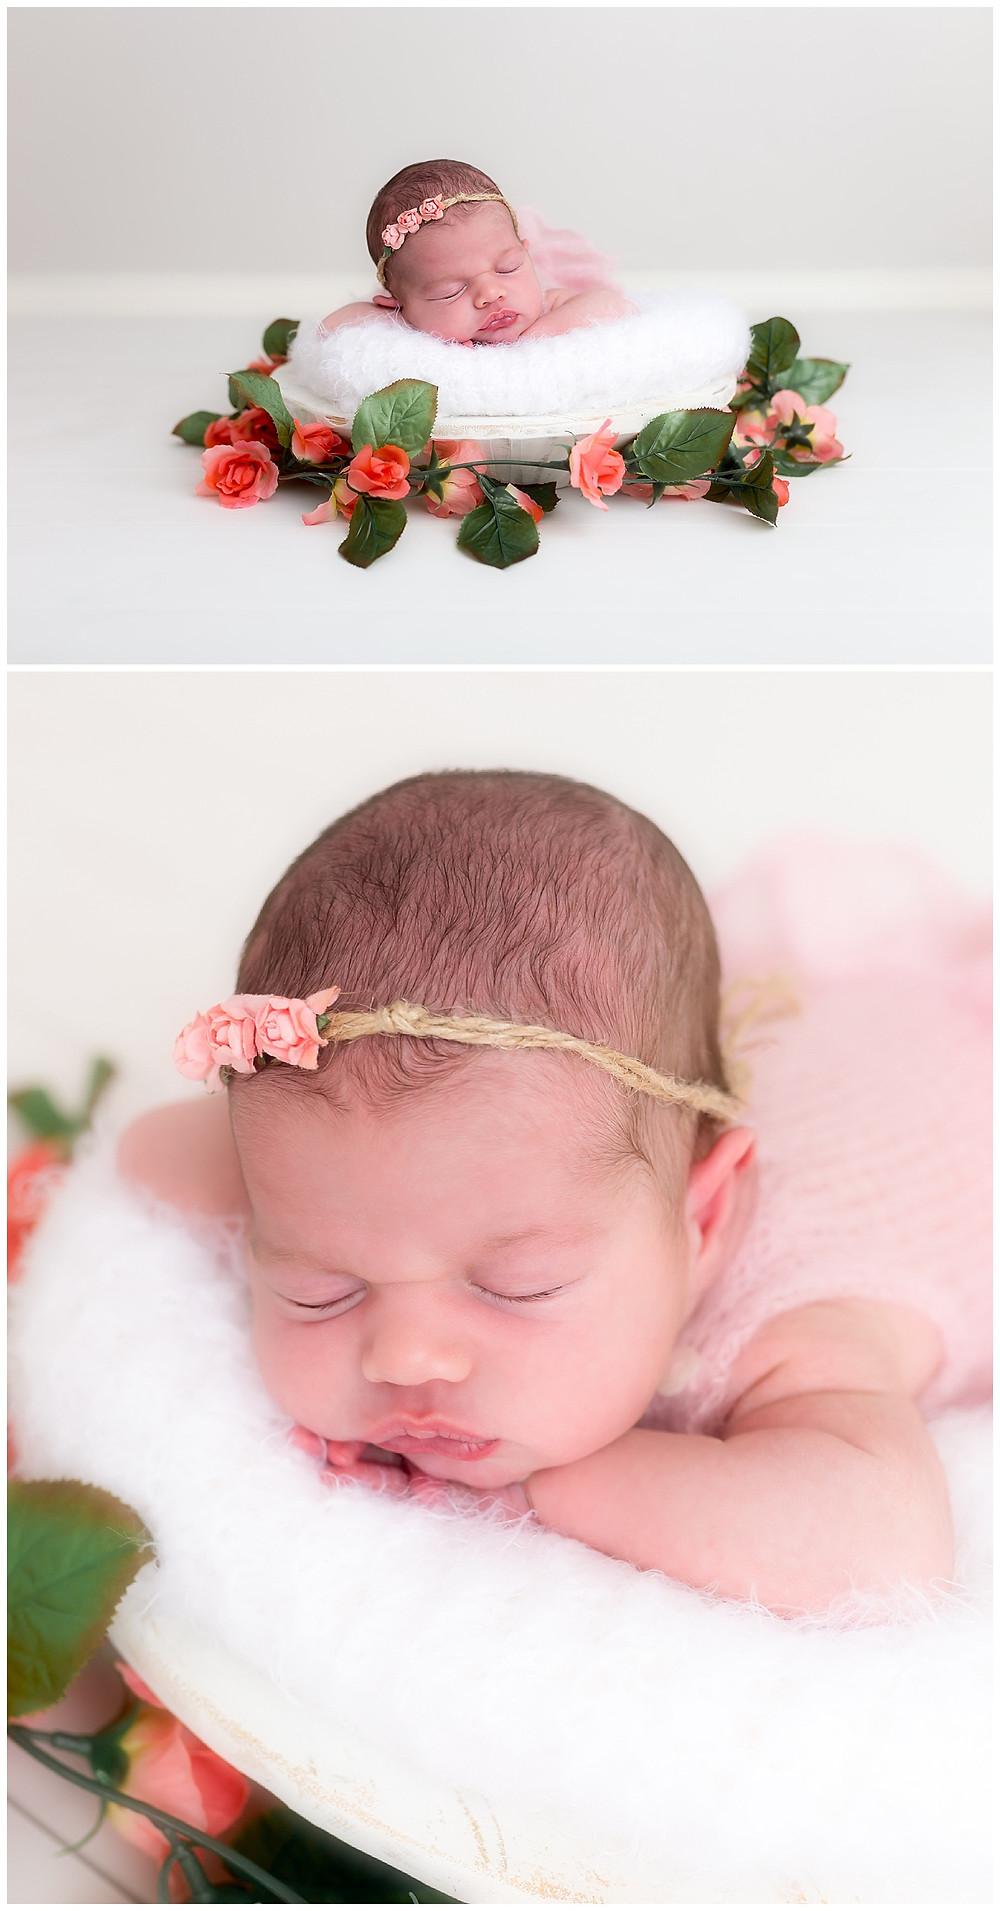 baby and newborn photography session, Dallas studio